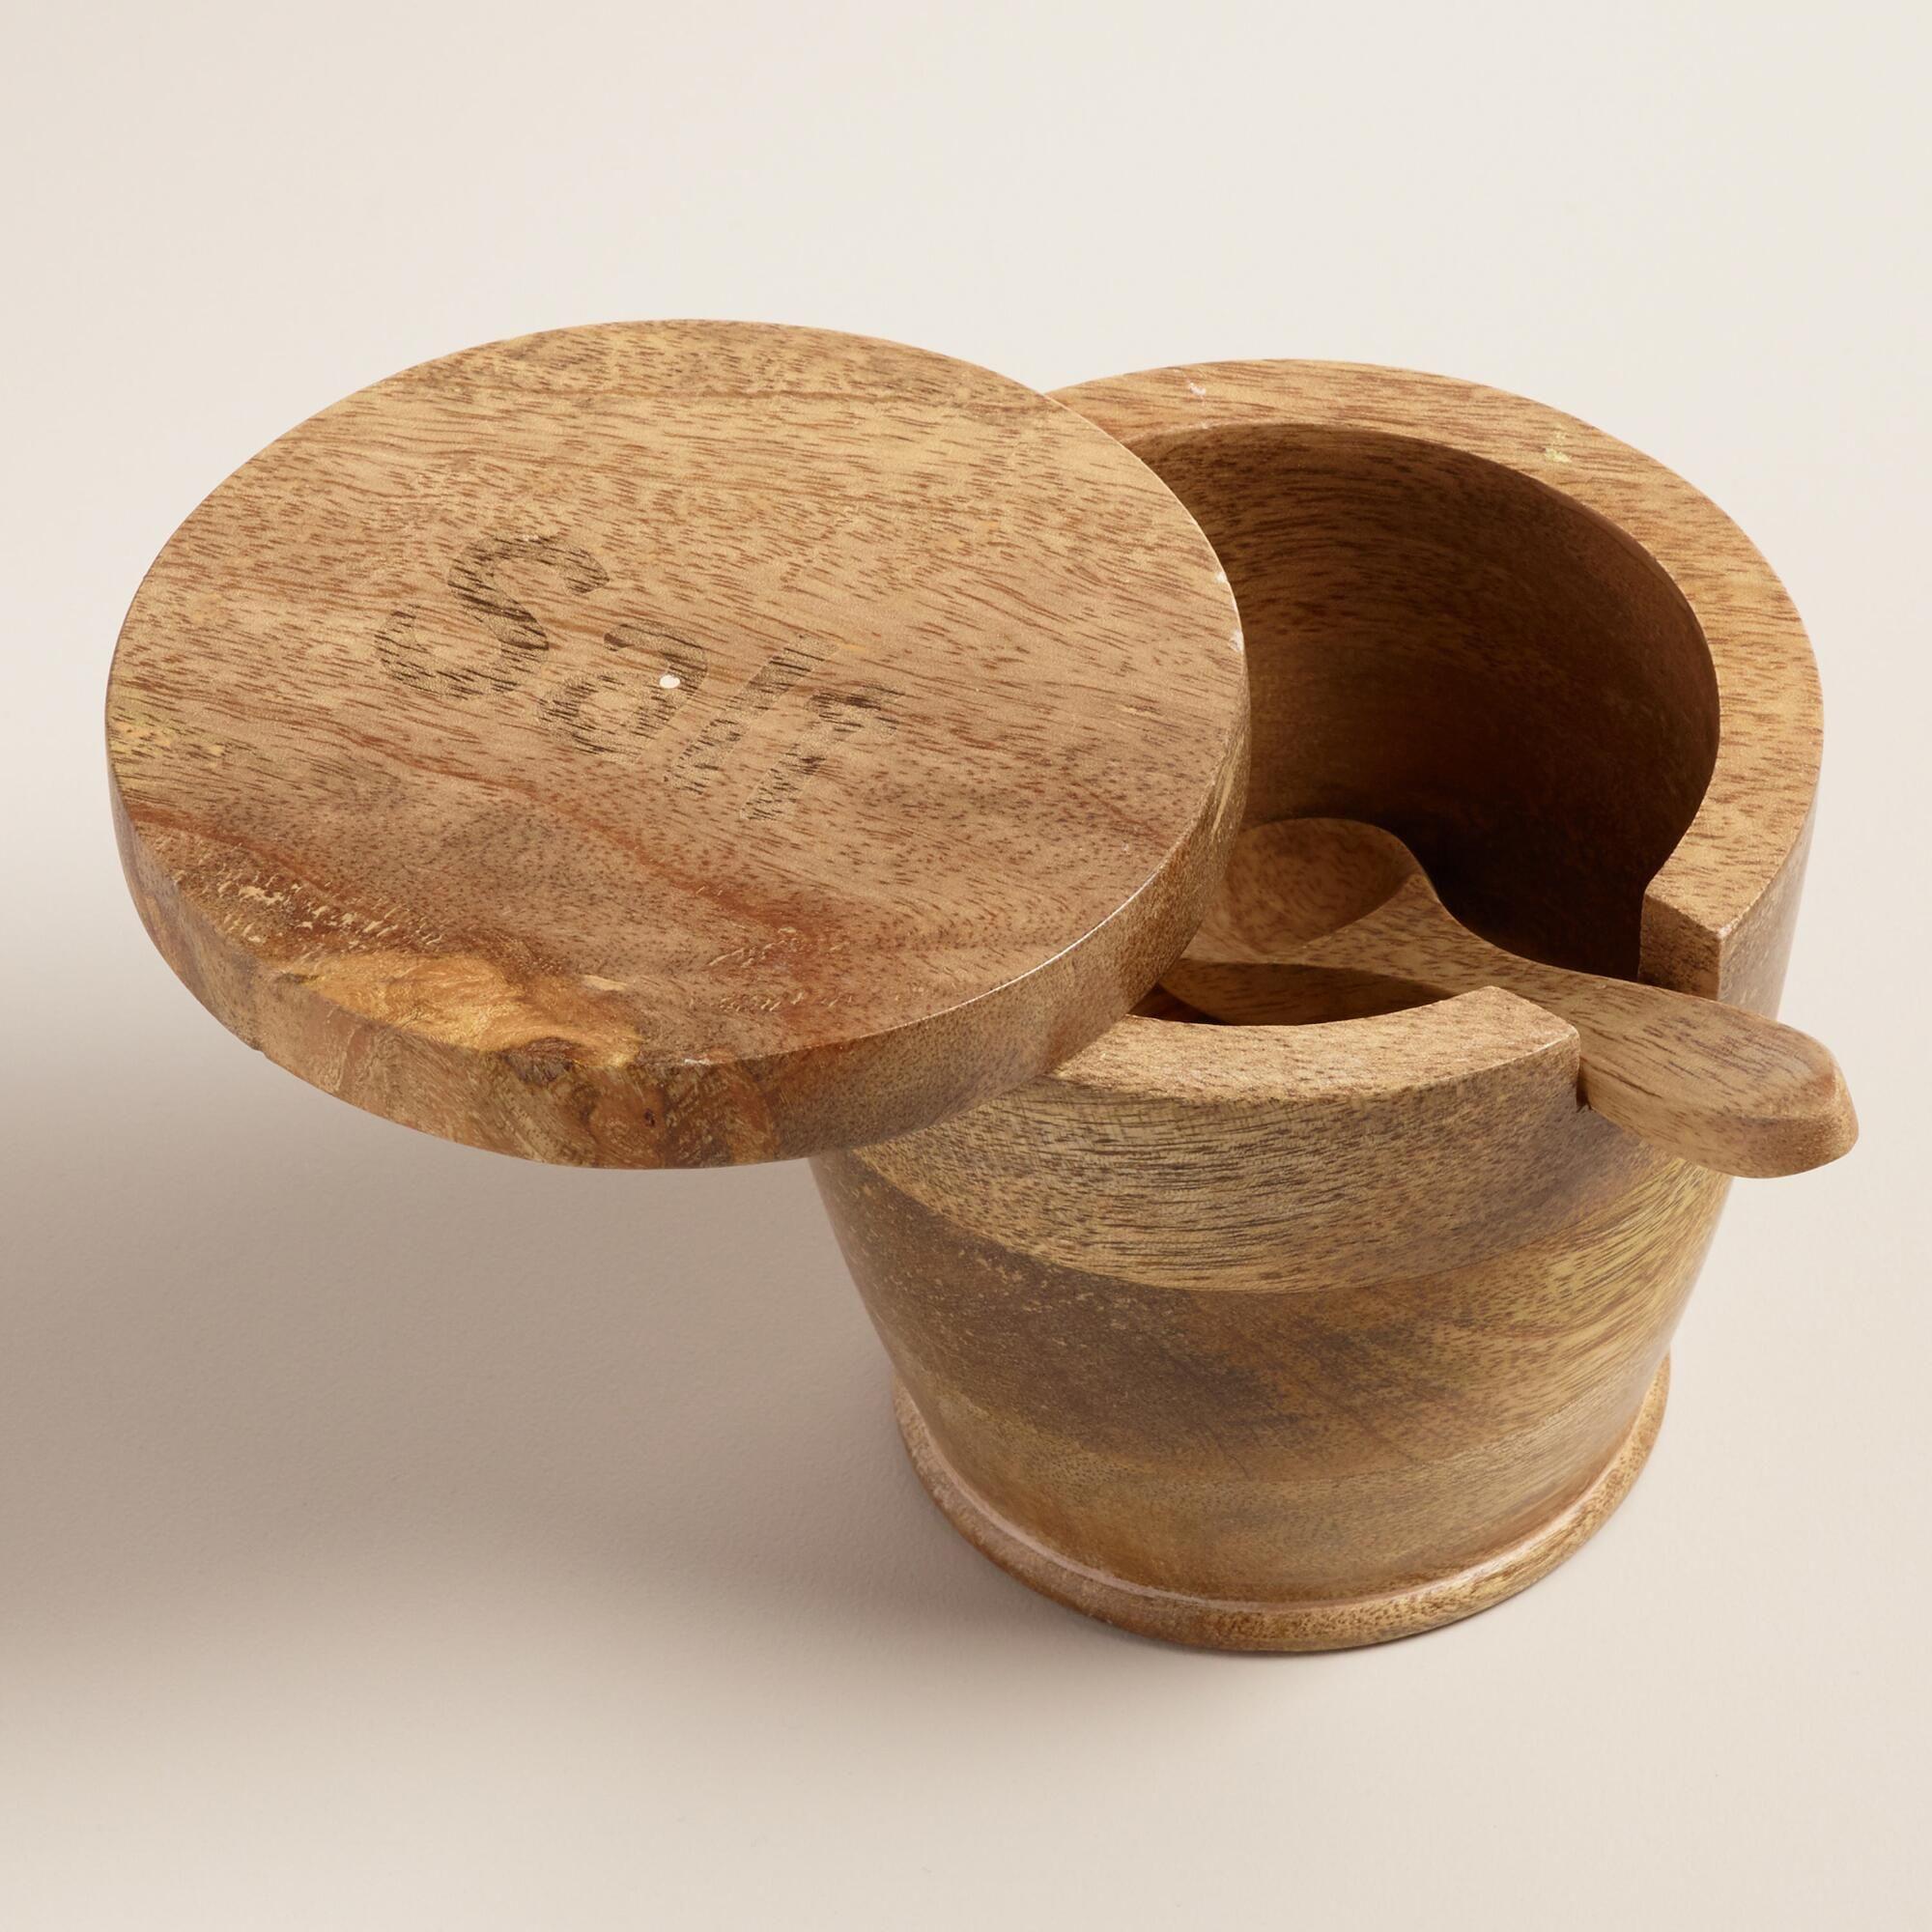 Mango Wood Lidded Salt Cellar With Spoon